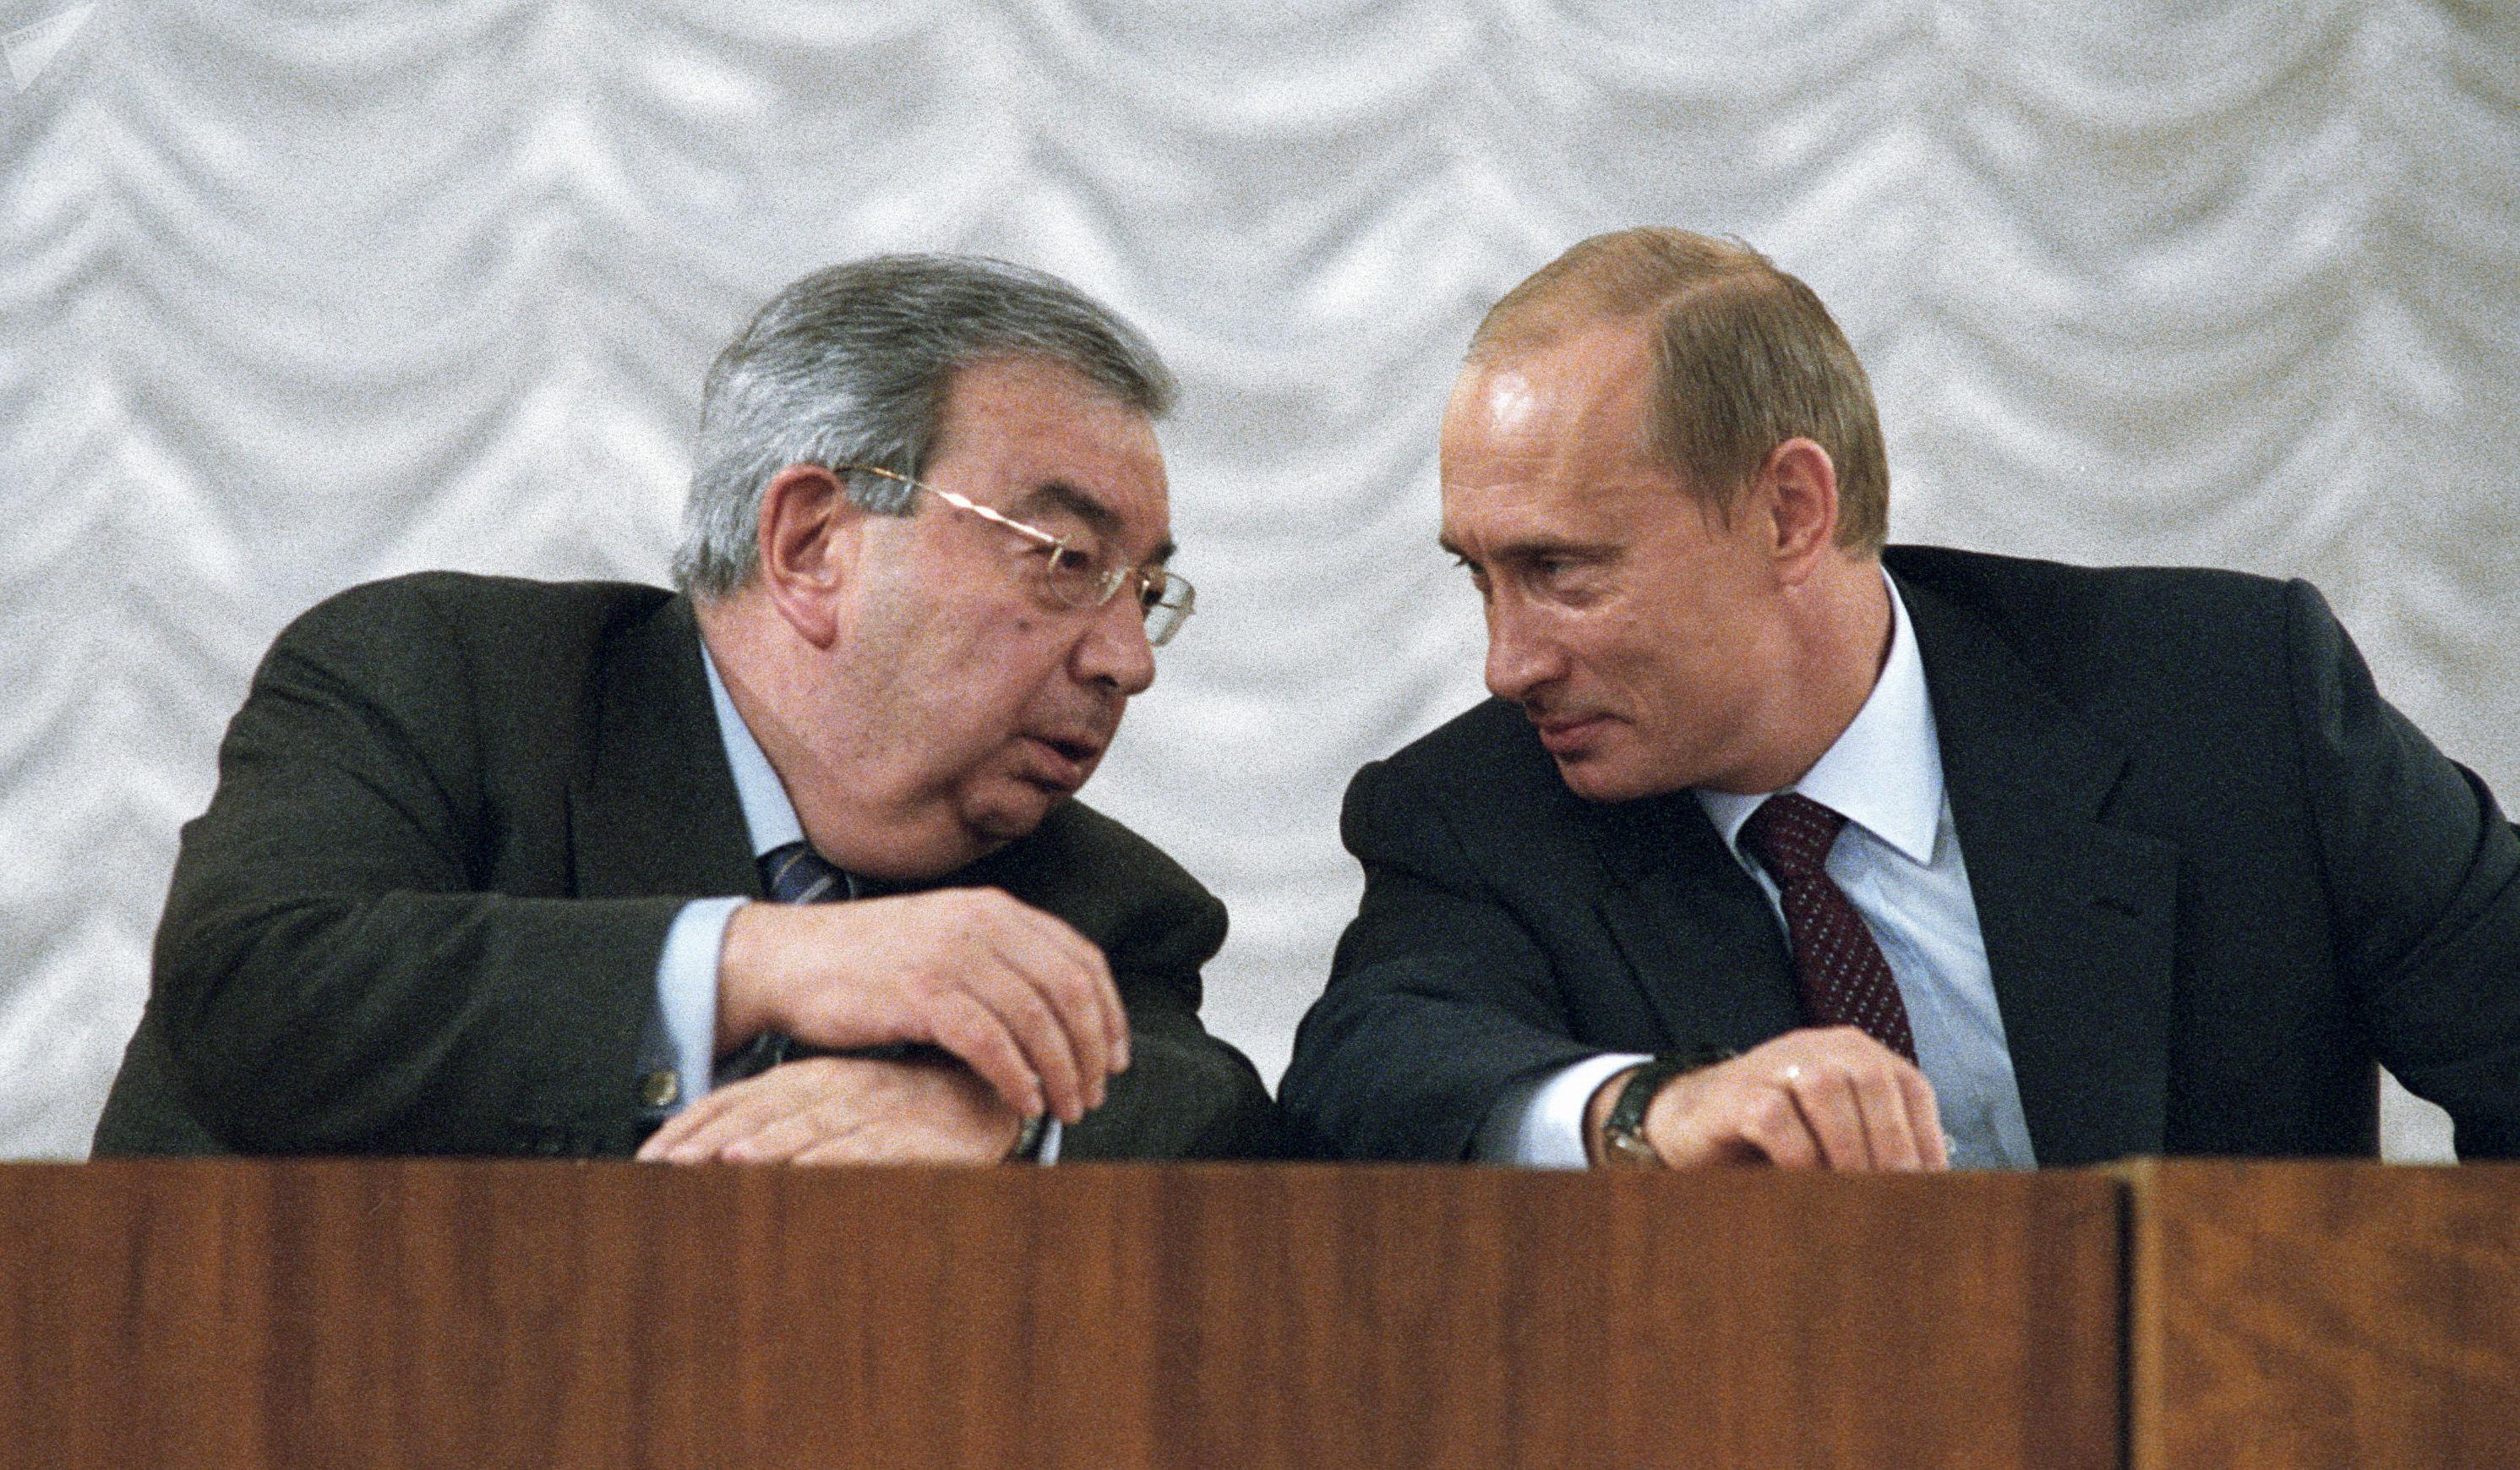 Evgueni Primakov, presidente de la Cámara de Comercio e Industria de Rusia, y Vladímir Putin, presidente de Rusia (2003)